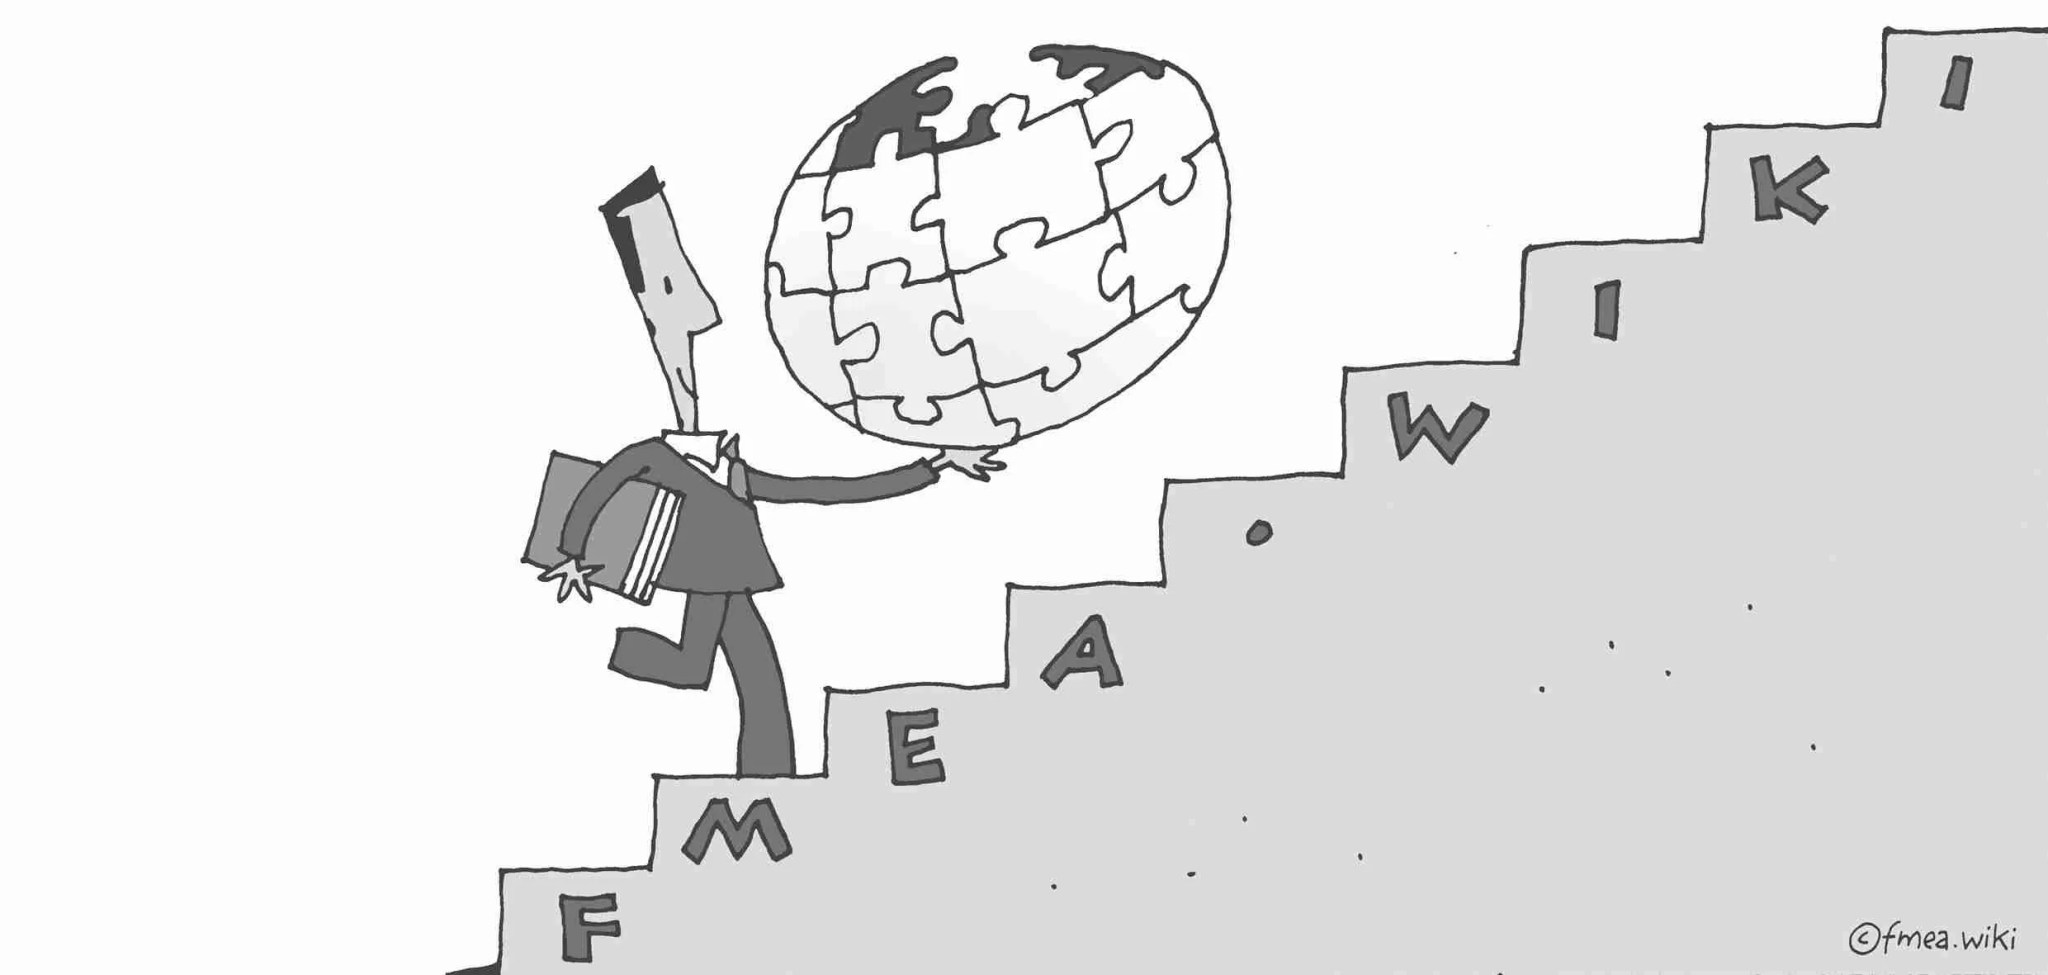 Fehler Möglichkeits Einfluss Analyse (FMEA) – FMEA.WIKI